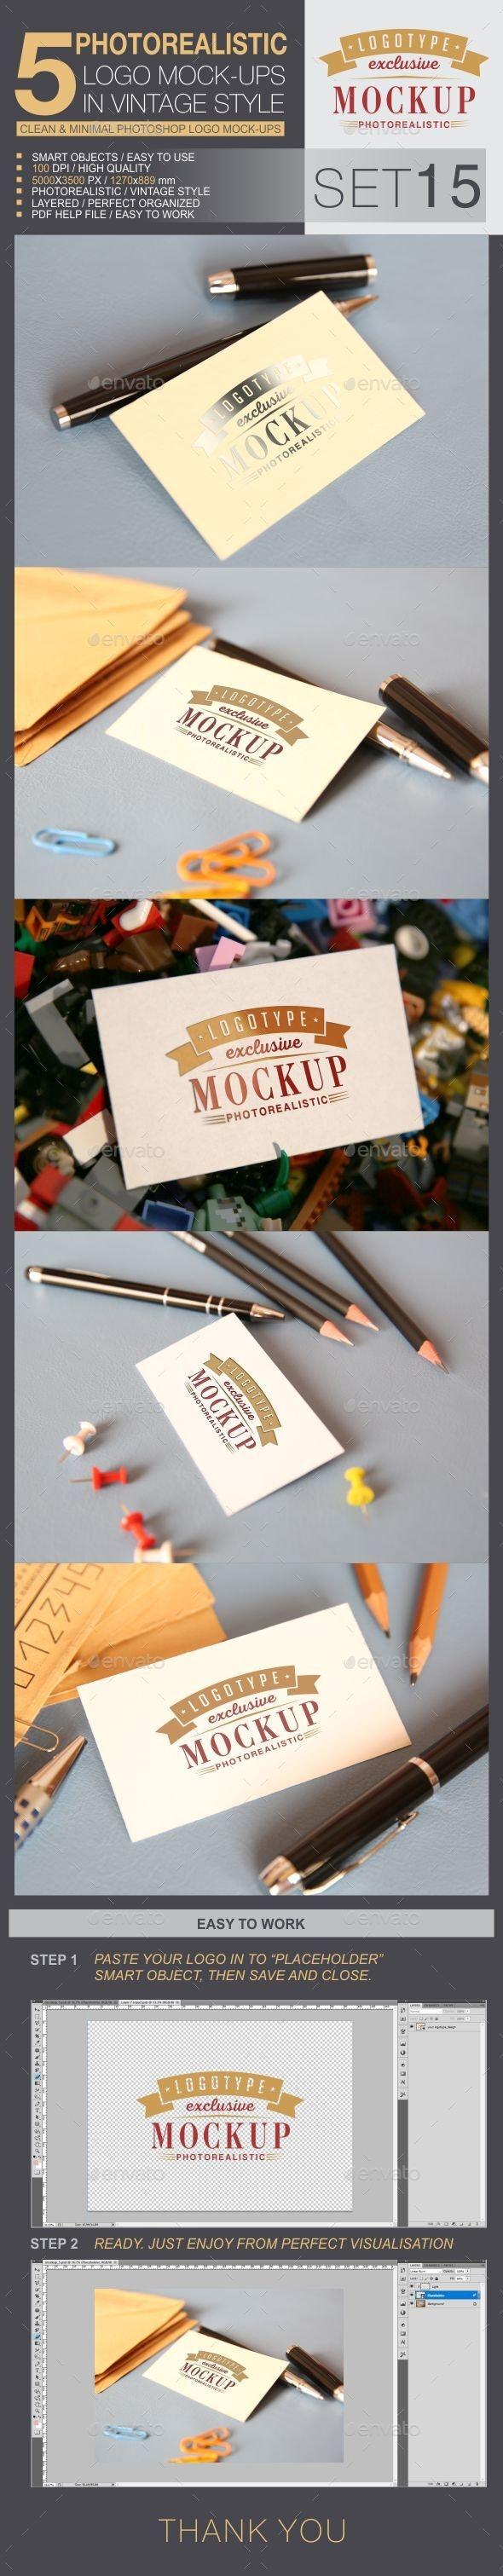 5 Logo Mock-Ups In Vintage Style - Set 15 - Logo Product Mock-Ups